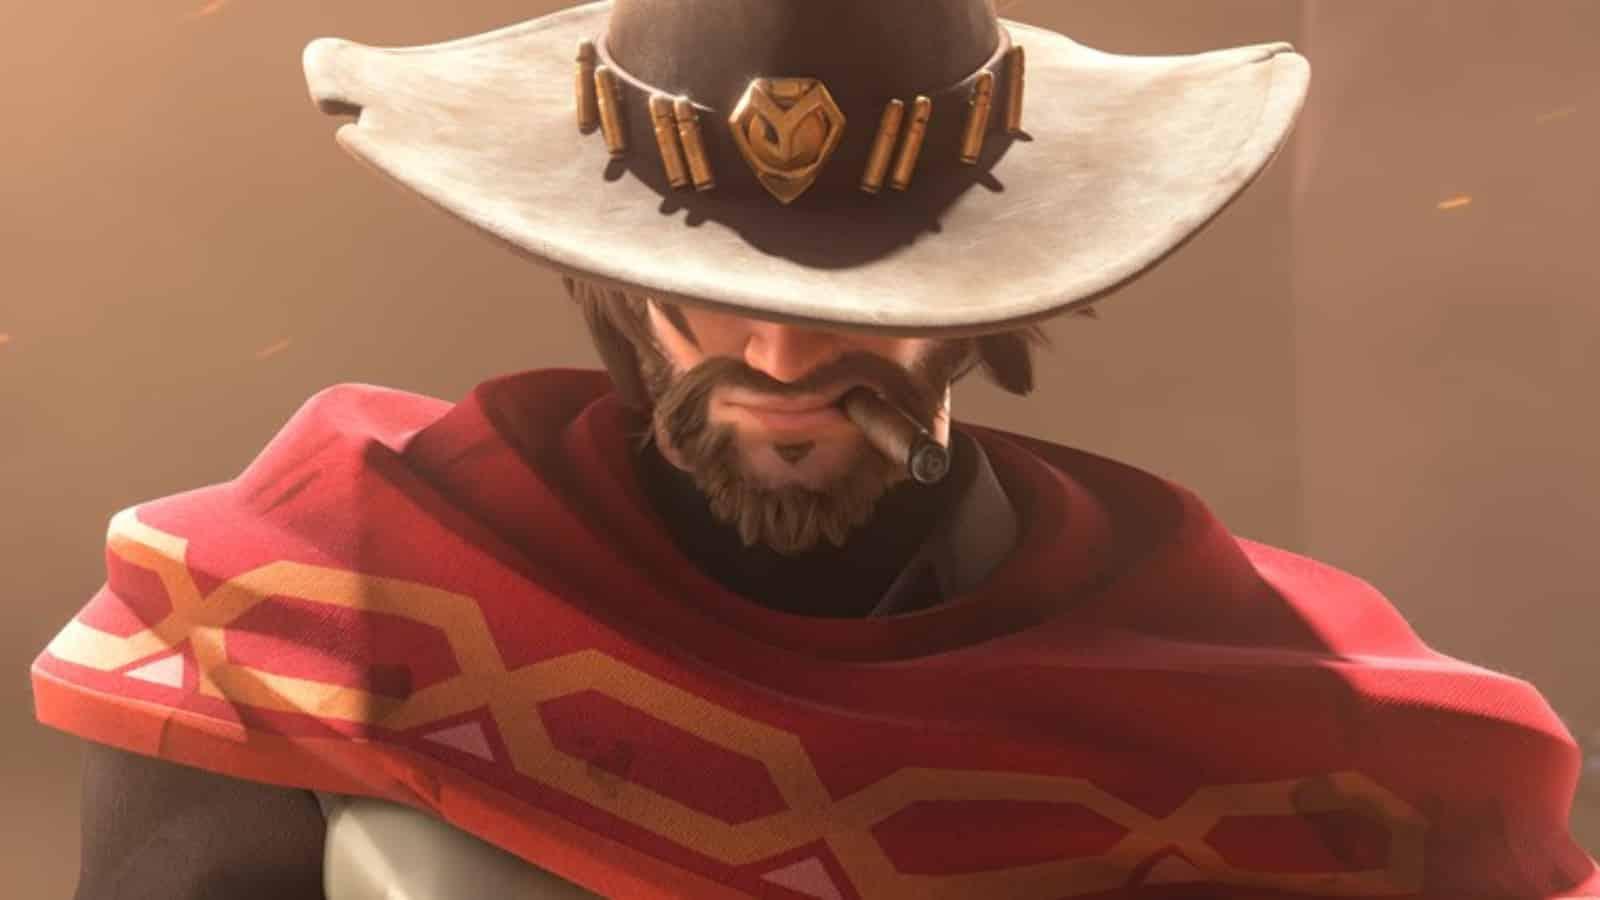 Cruel practices lost an Overwatch hero his name